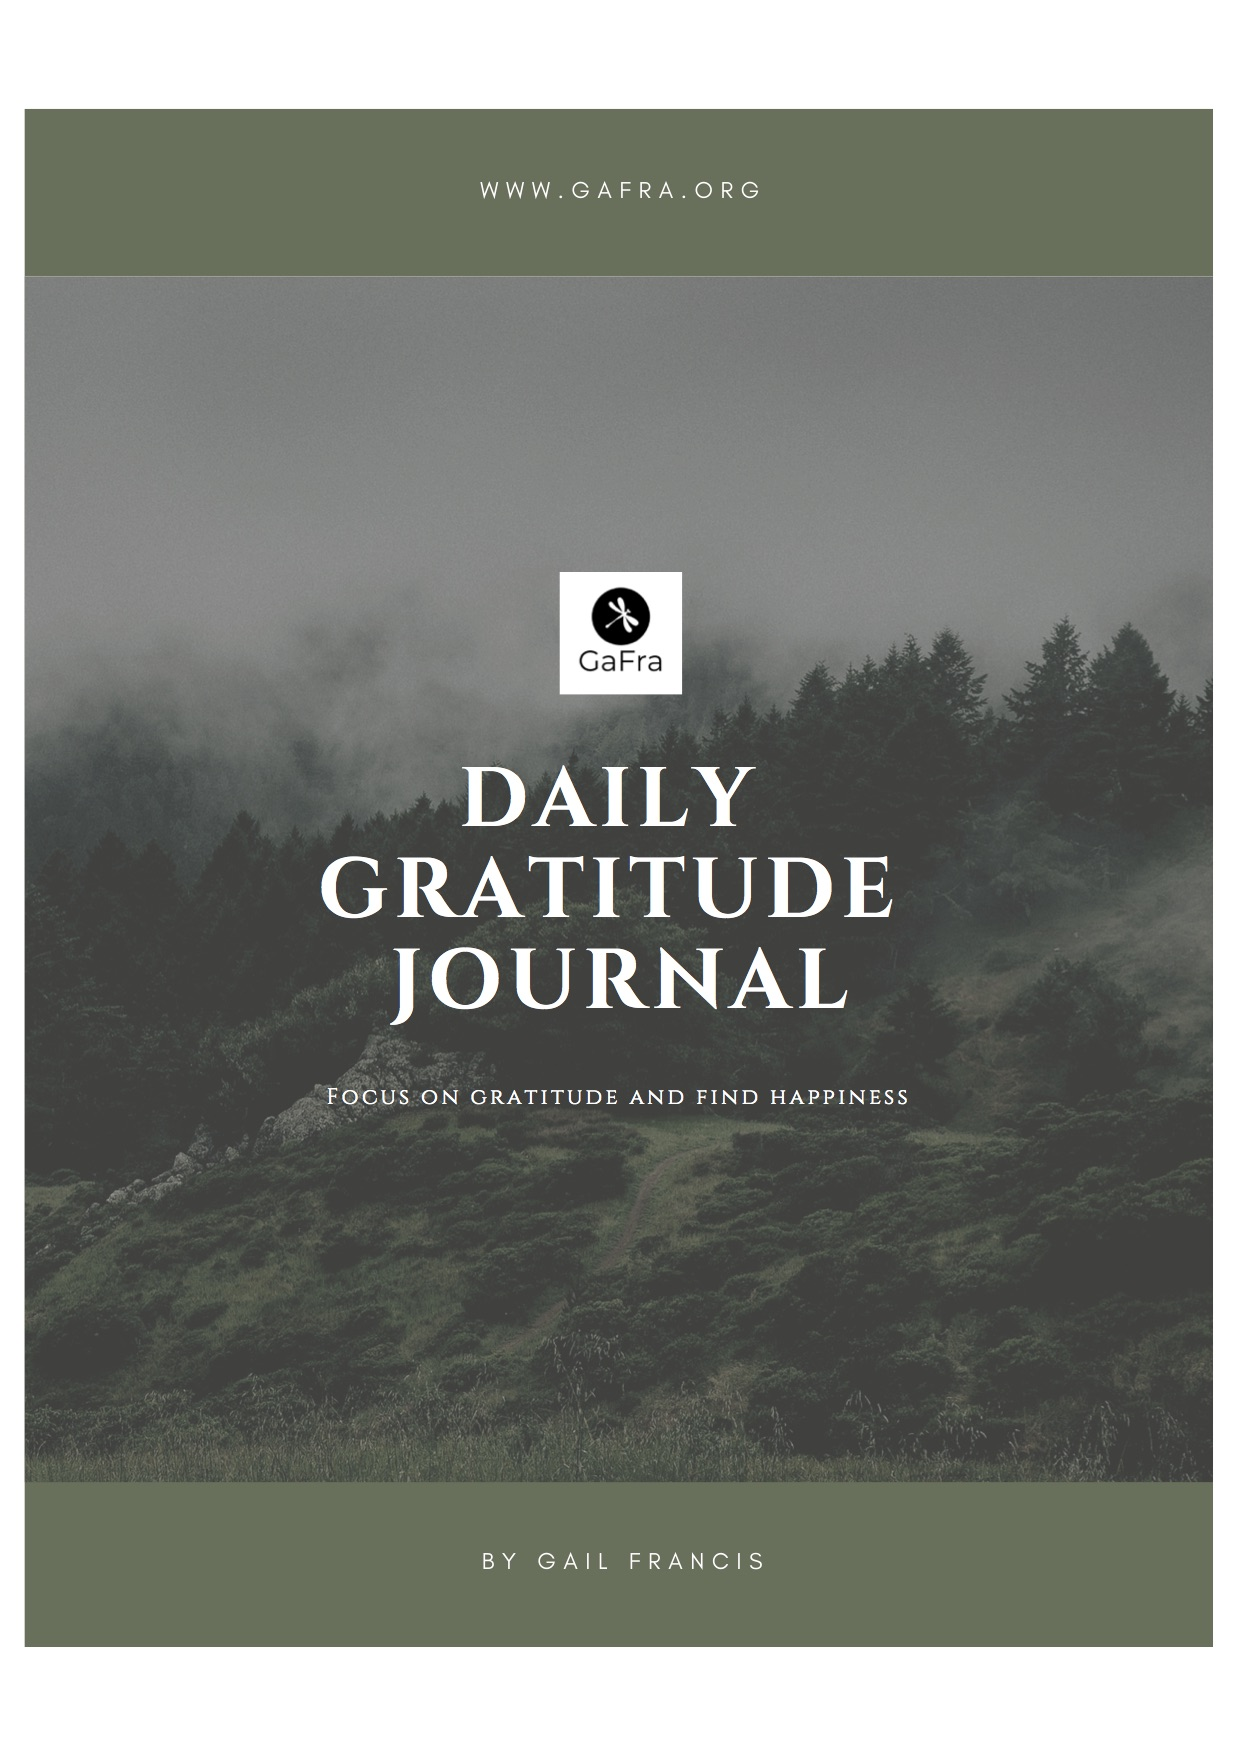 Gratitude Journal available at gafra.org